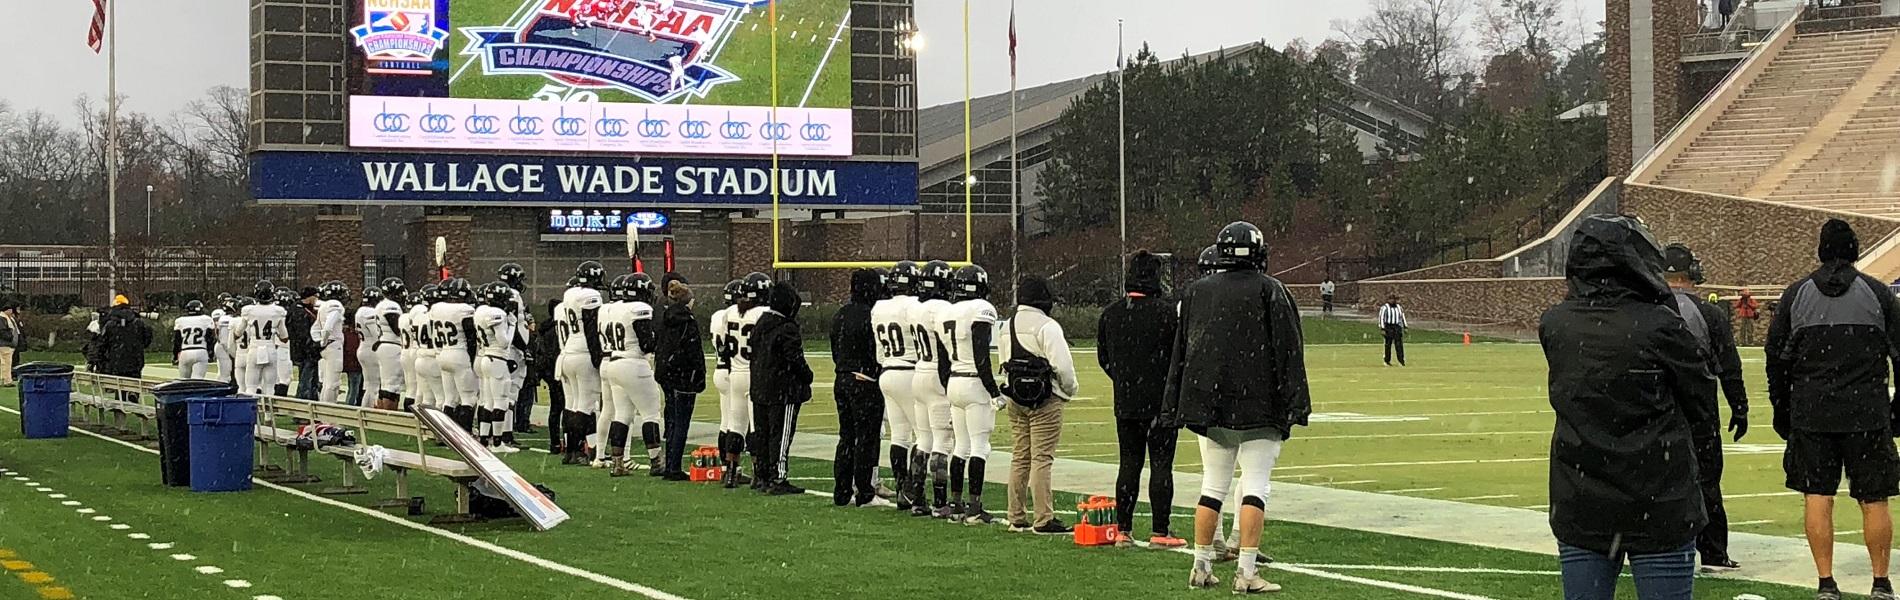 North Carolina High School Football Championships at Duke University